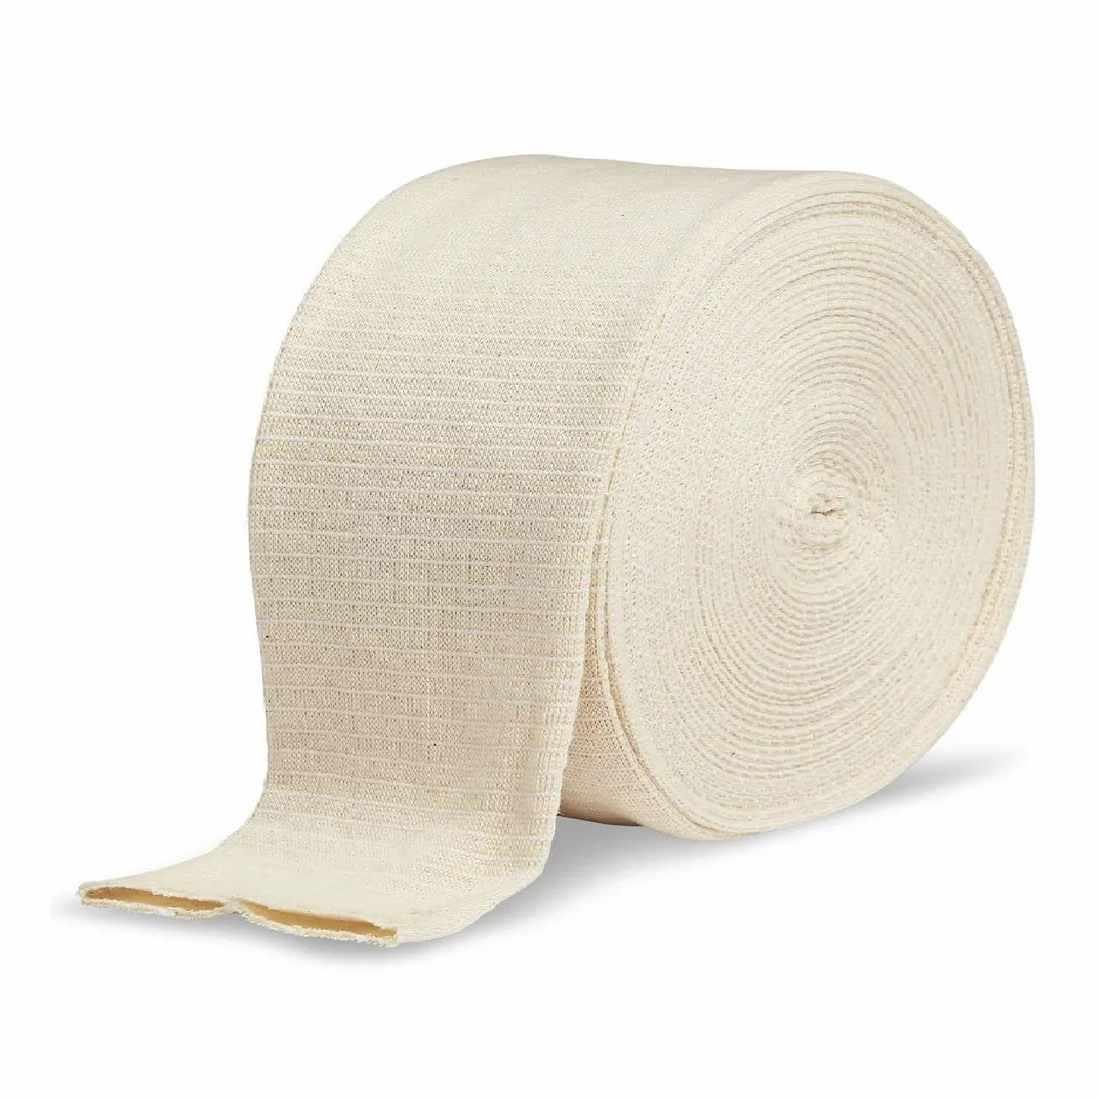 Dermafit Tubular Support Compression Bandage, Size G